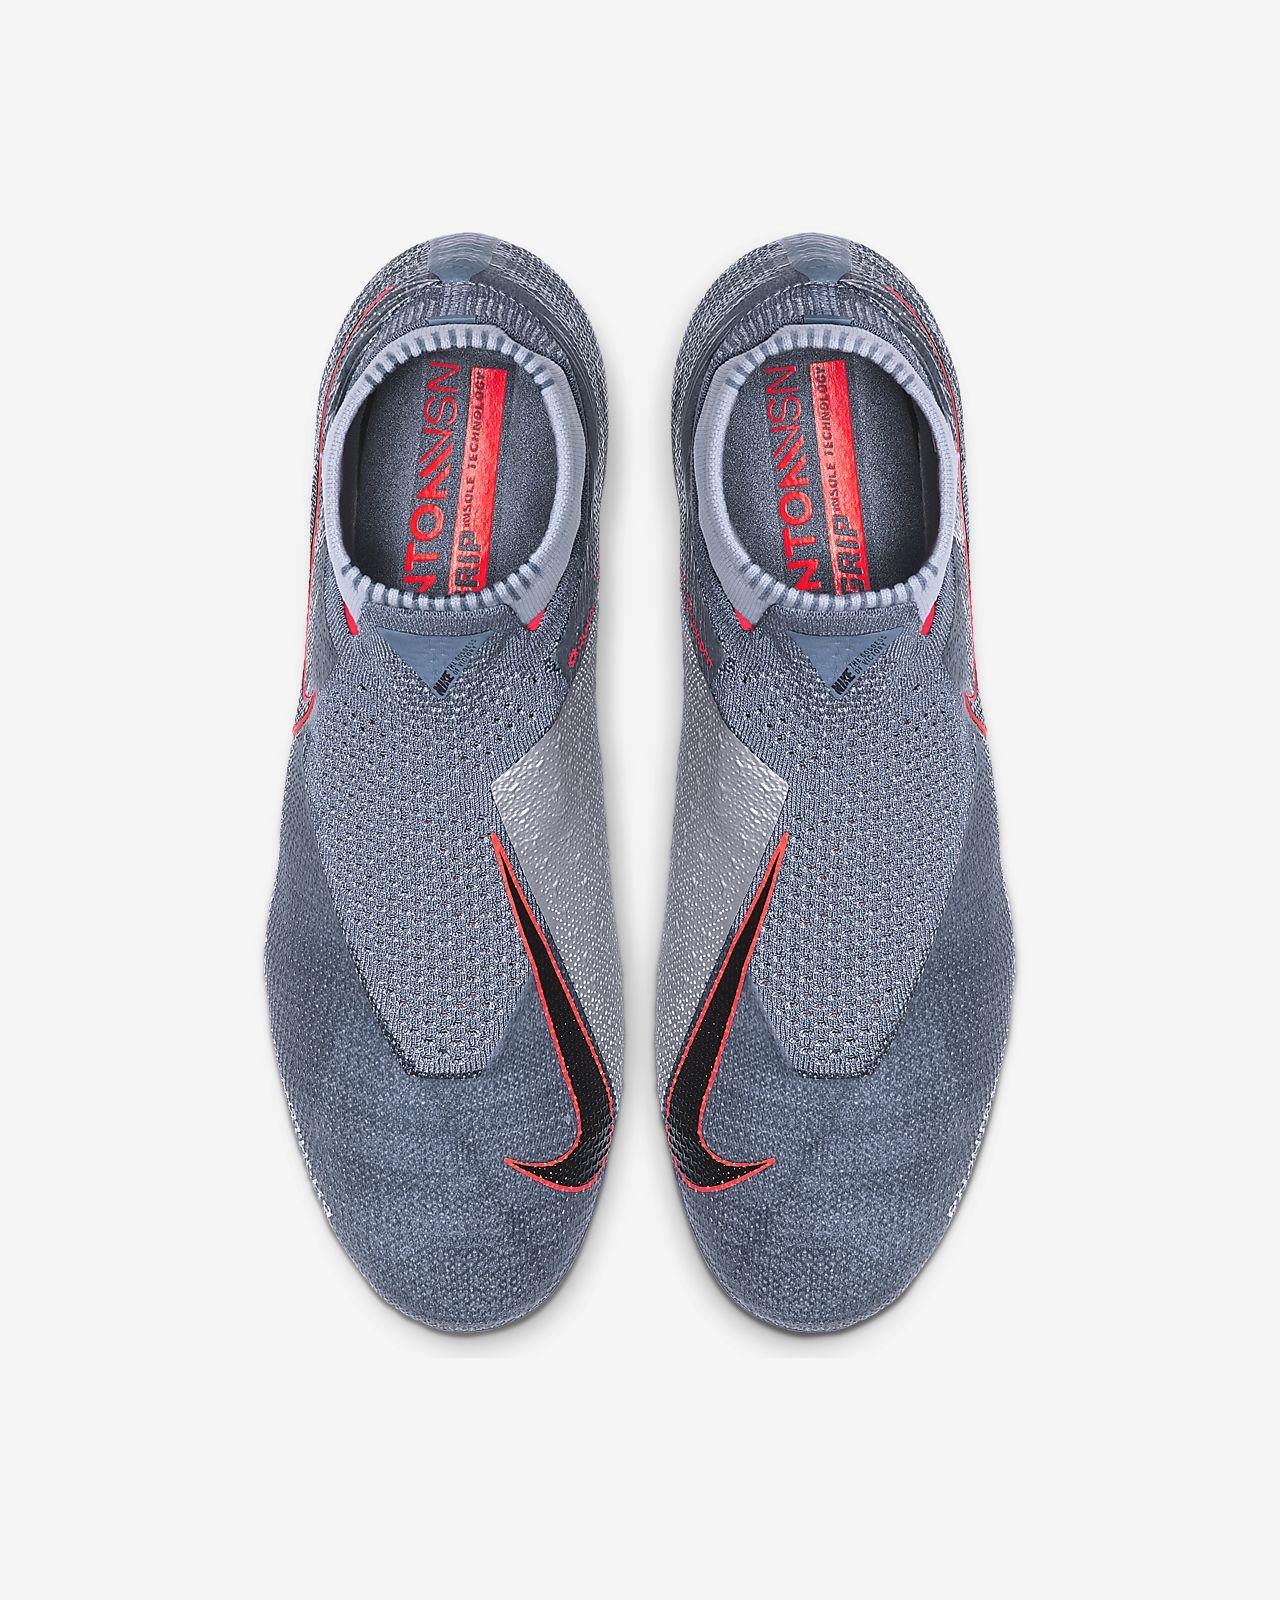 883f9e8ce7afad Nike Phantom Vision Elite Dynamic Fit FG Firm-Ground Soccer Cleat ...